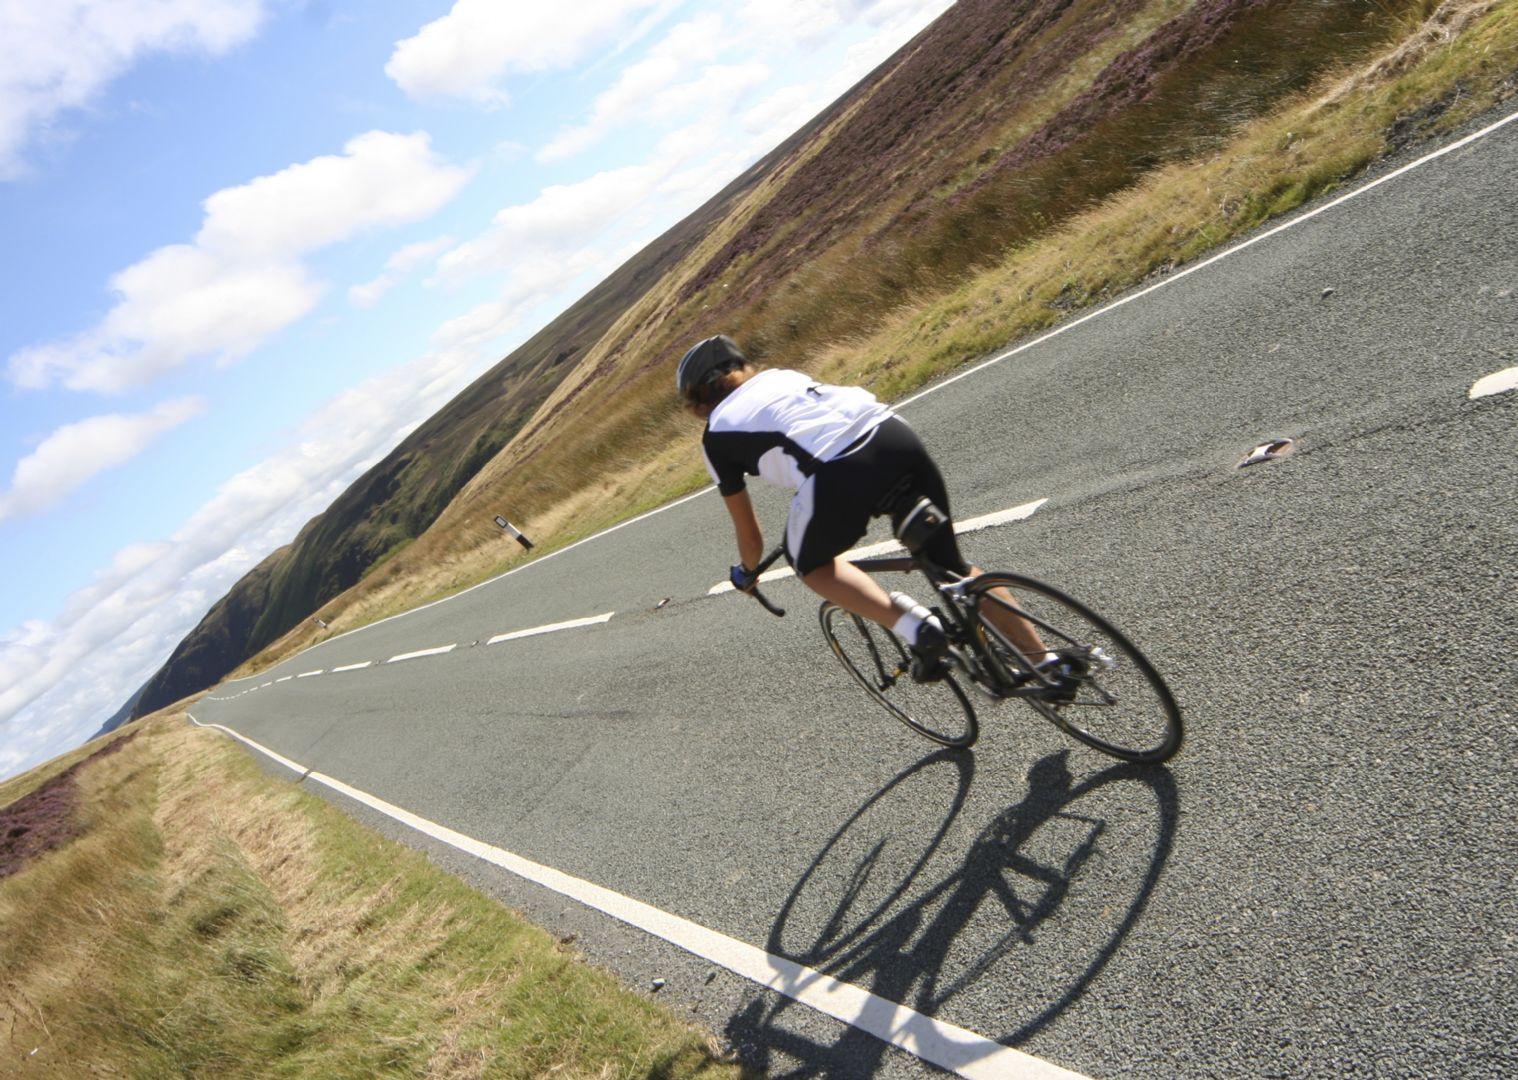 North Wales Road Cycling Weekend 51.jpg - UK - North Wales - Guided Road Cycling Weekend - Road Cycling